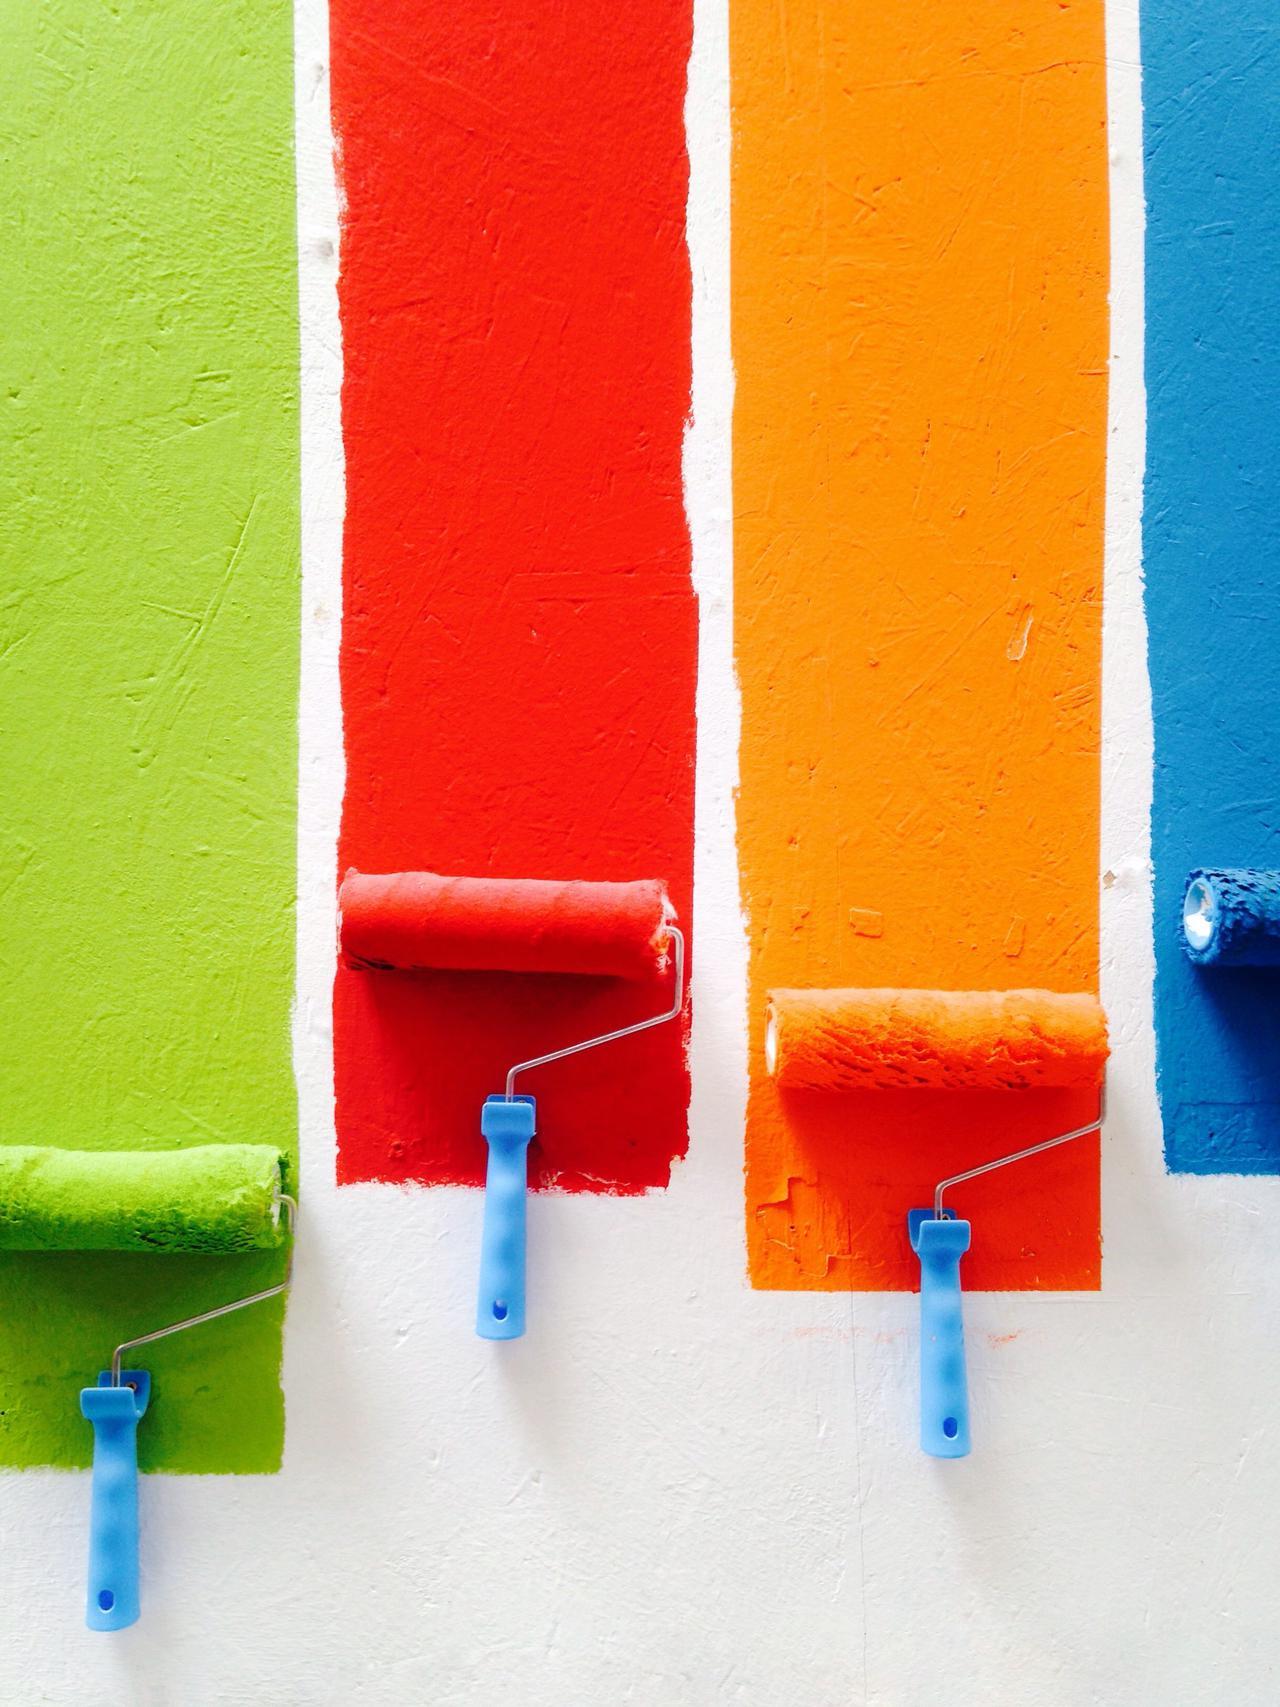 Learn how to maintain exterior grade acrylic latex paint.